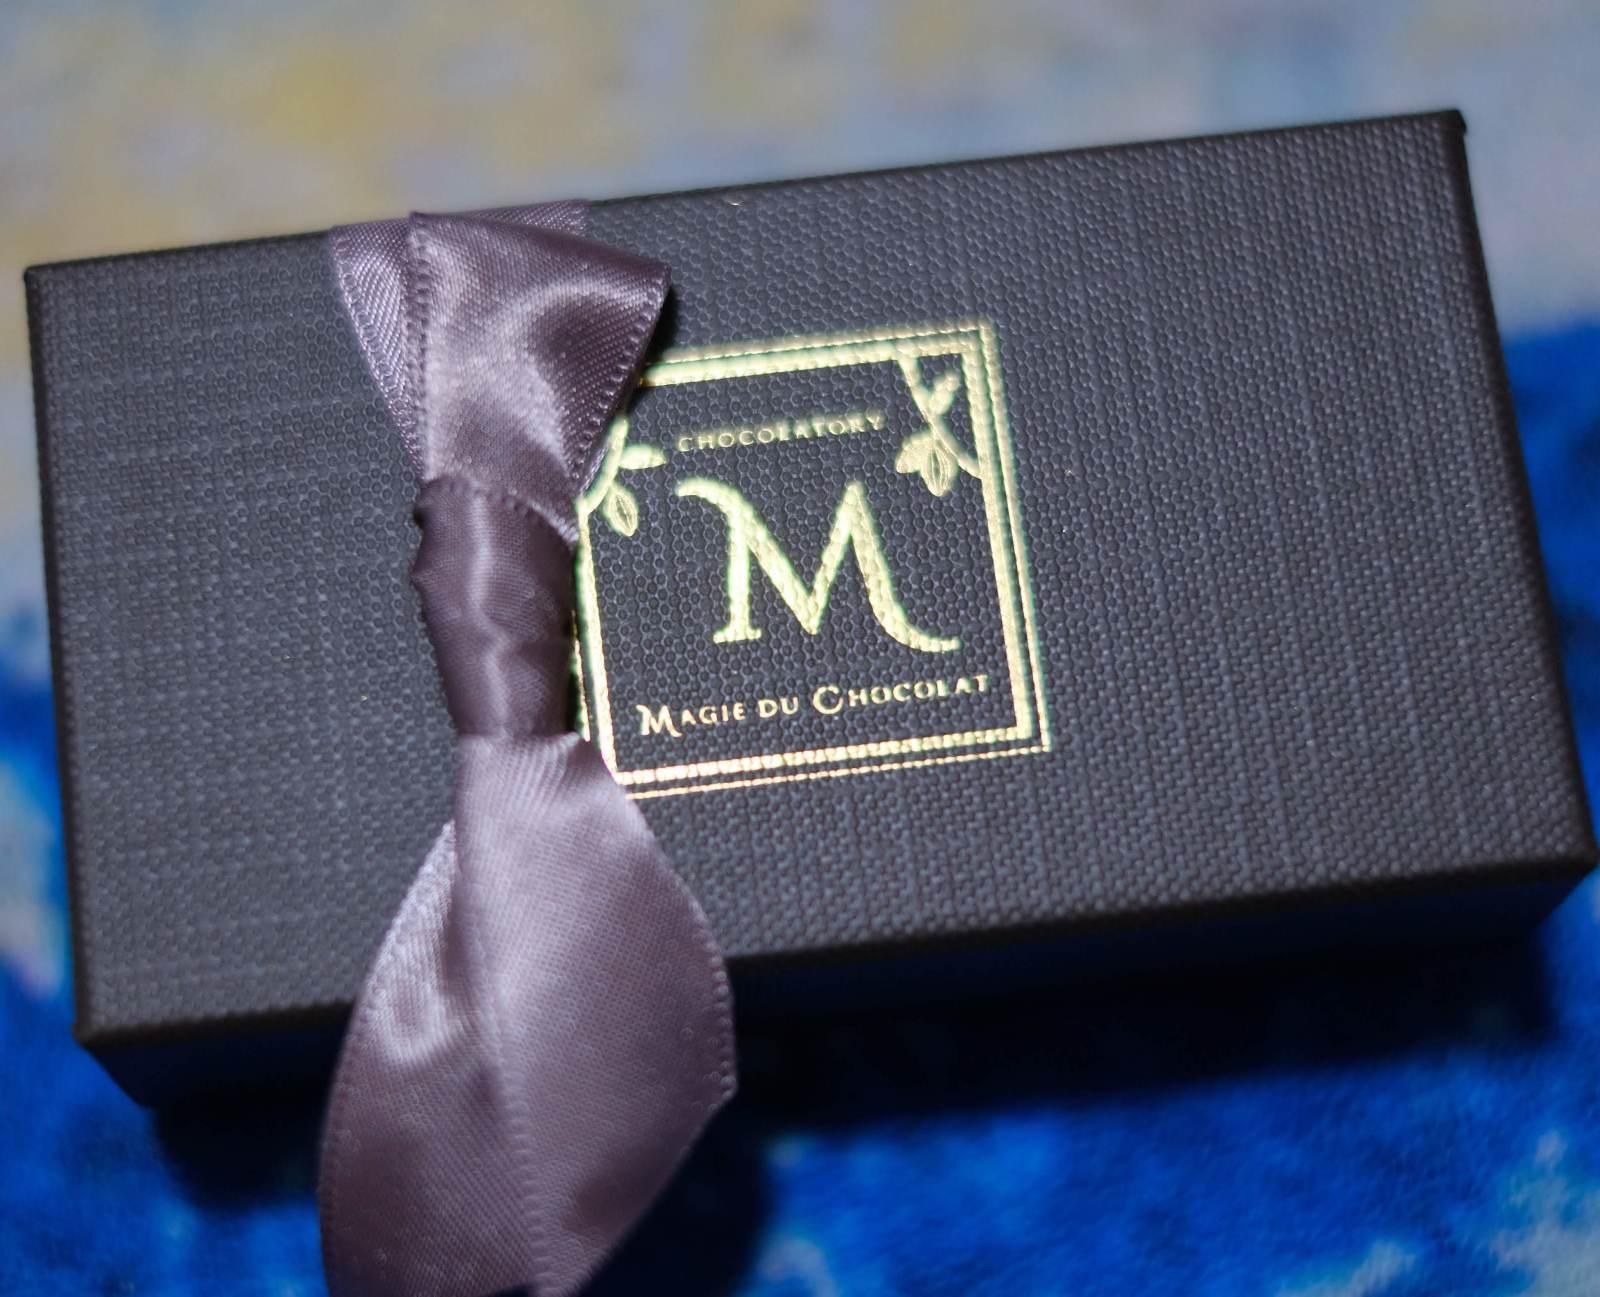 Magie du chocolat(マジドショコラ)@自由が丘 優雅なチョコレート屋さんでホワイトデーお返しと自分用ご褒美!_b0024832_00012190.jpg